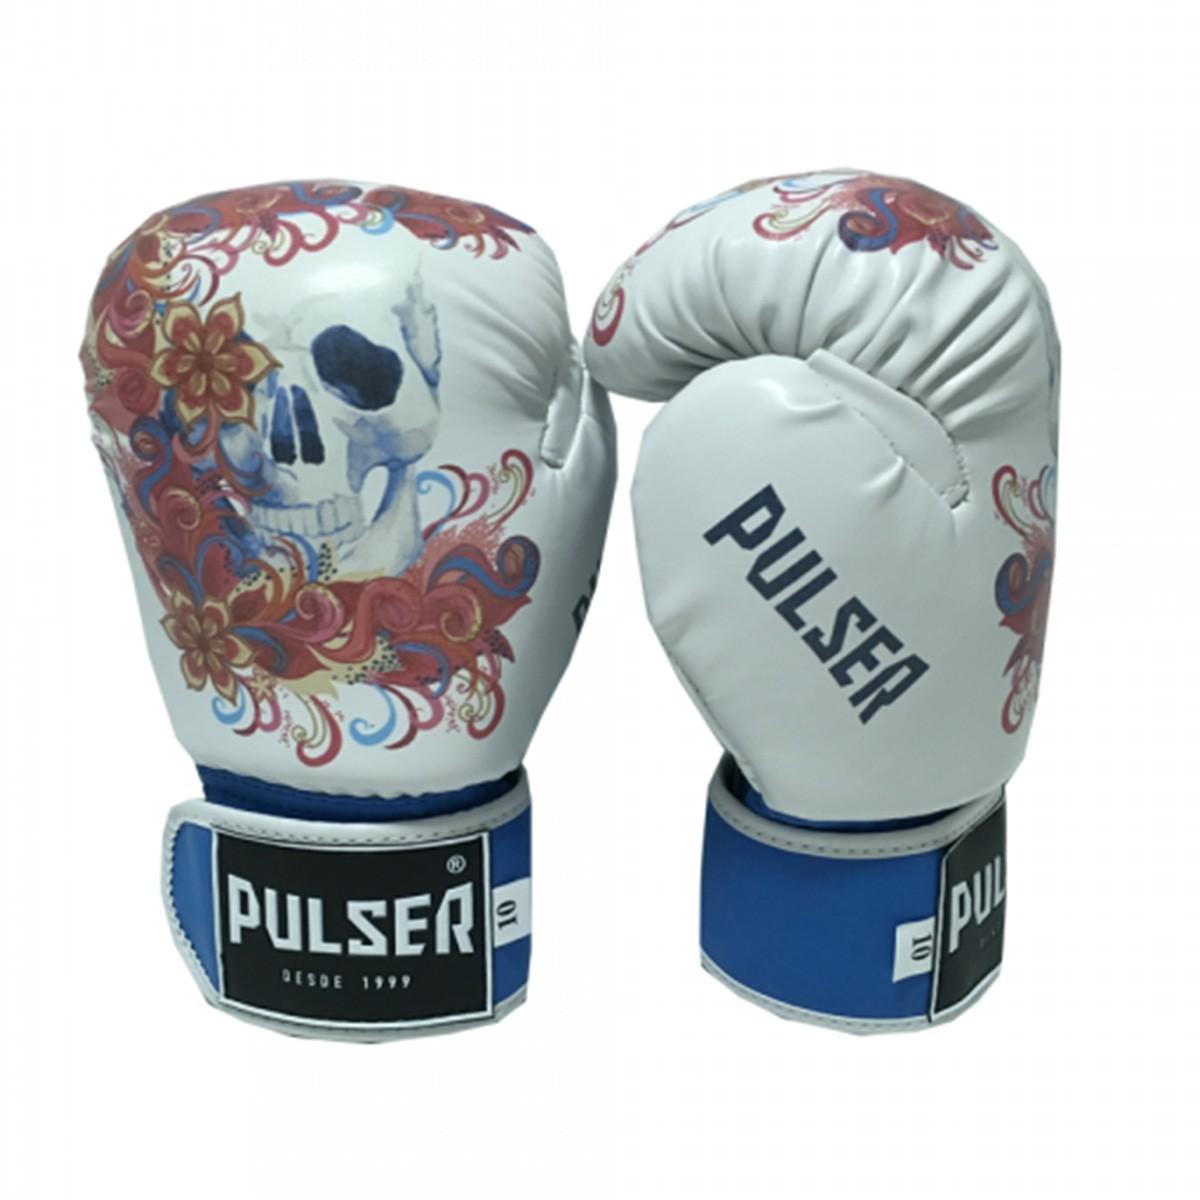 Kit de Muay Thai / Kickboxing Feminino 10oz - Caveira Azul Floral - Pulser  - PRALUTA SHOP